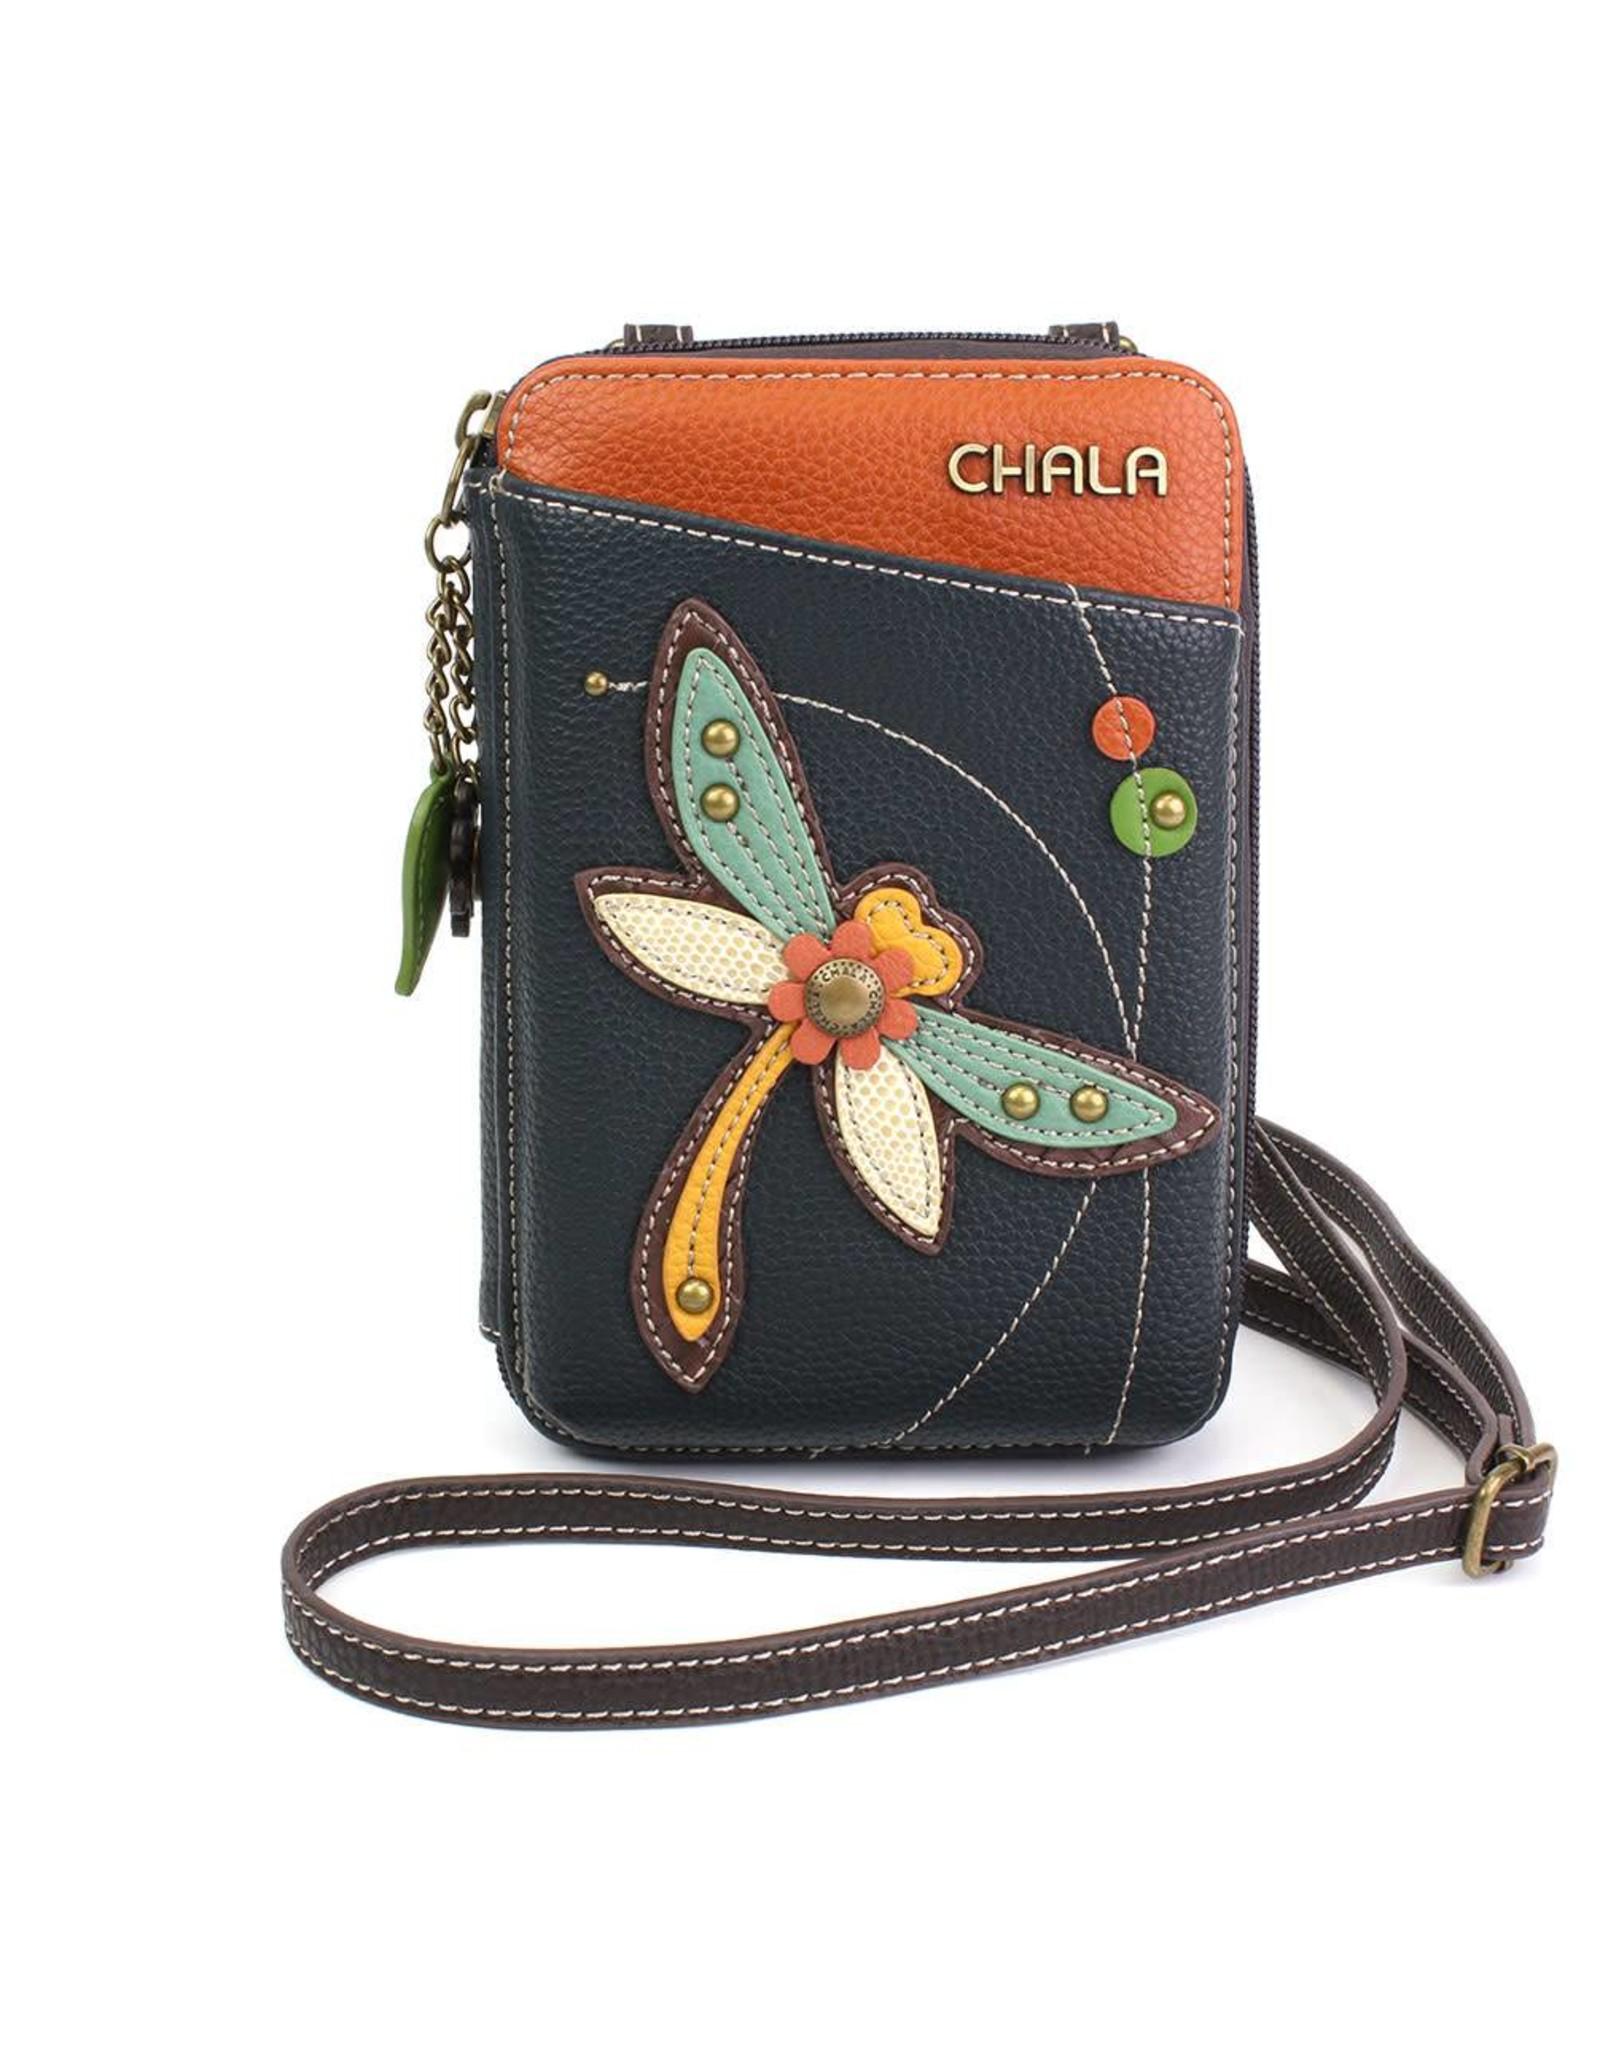 Chala Wallet Crossbody Dragonfly